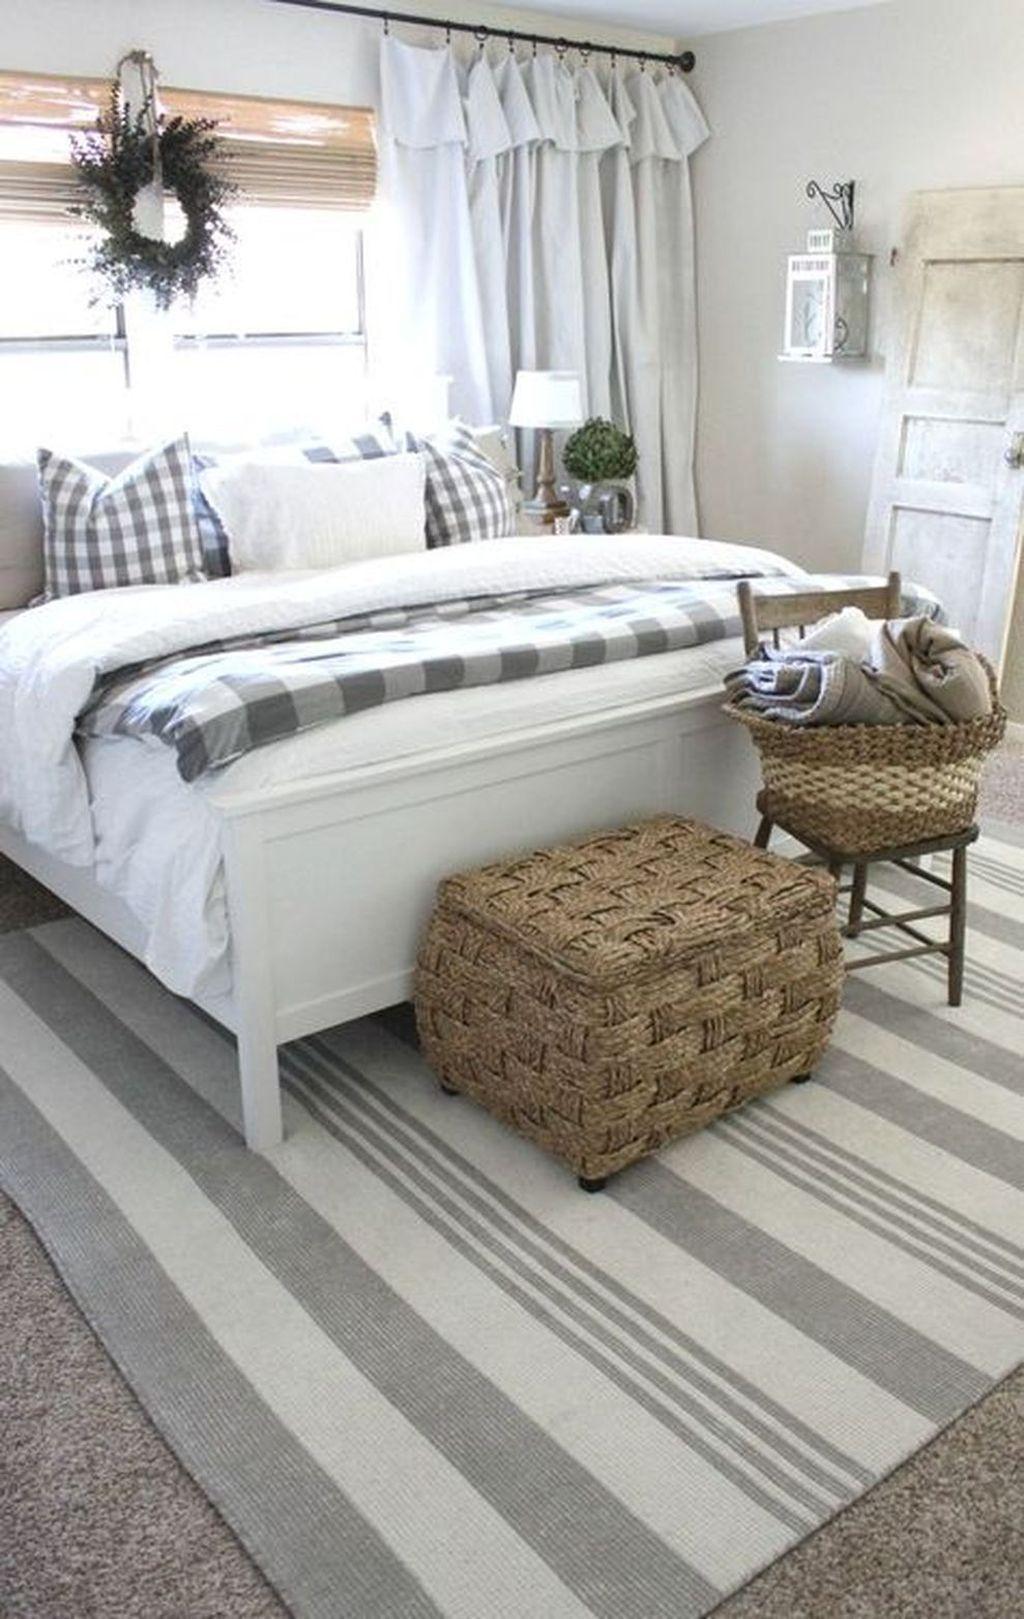 Rustic Farmhouse Style Master Bedroom Ideas 54 Farmhouse Style